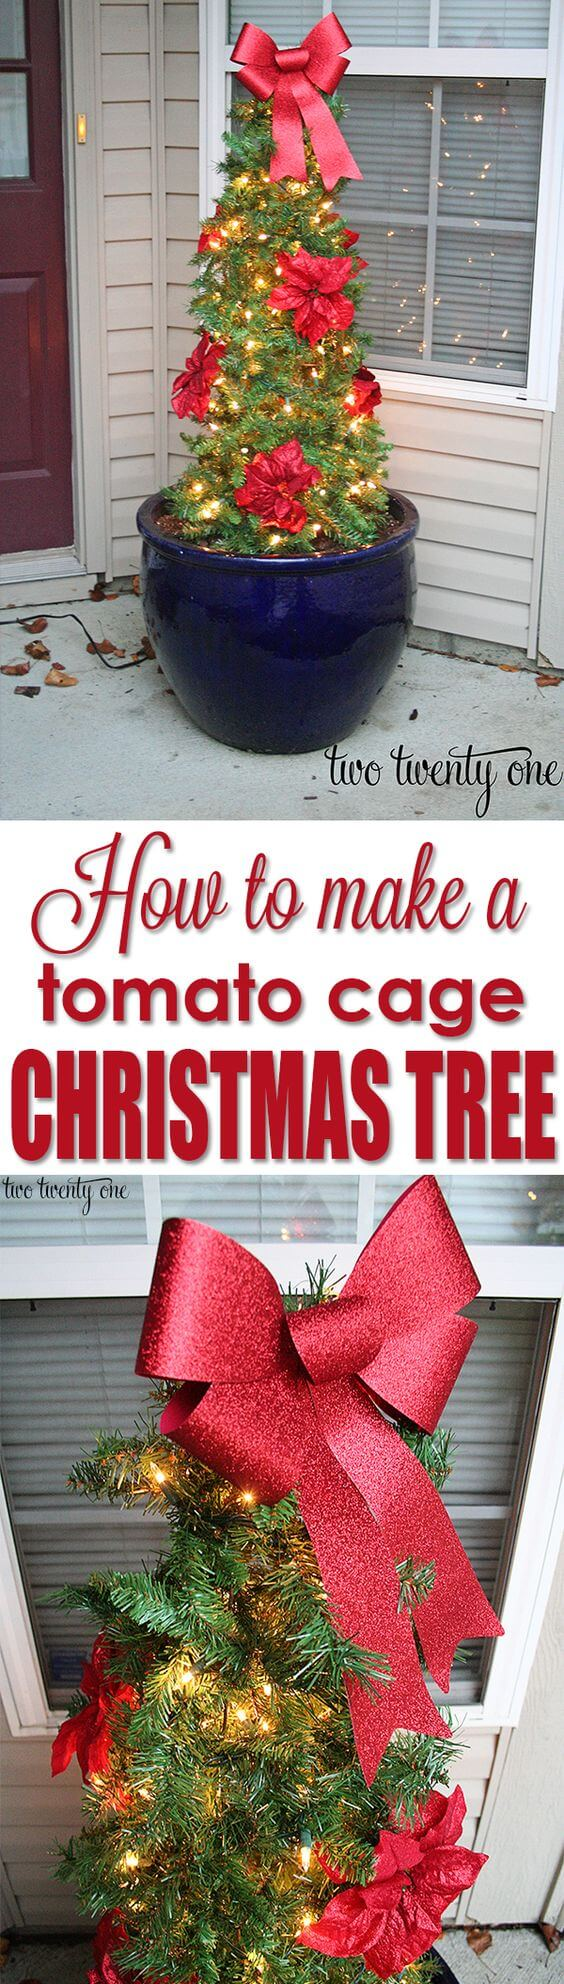 DIY Decorative Tomato Cage Christmas Tree